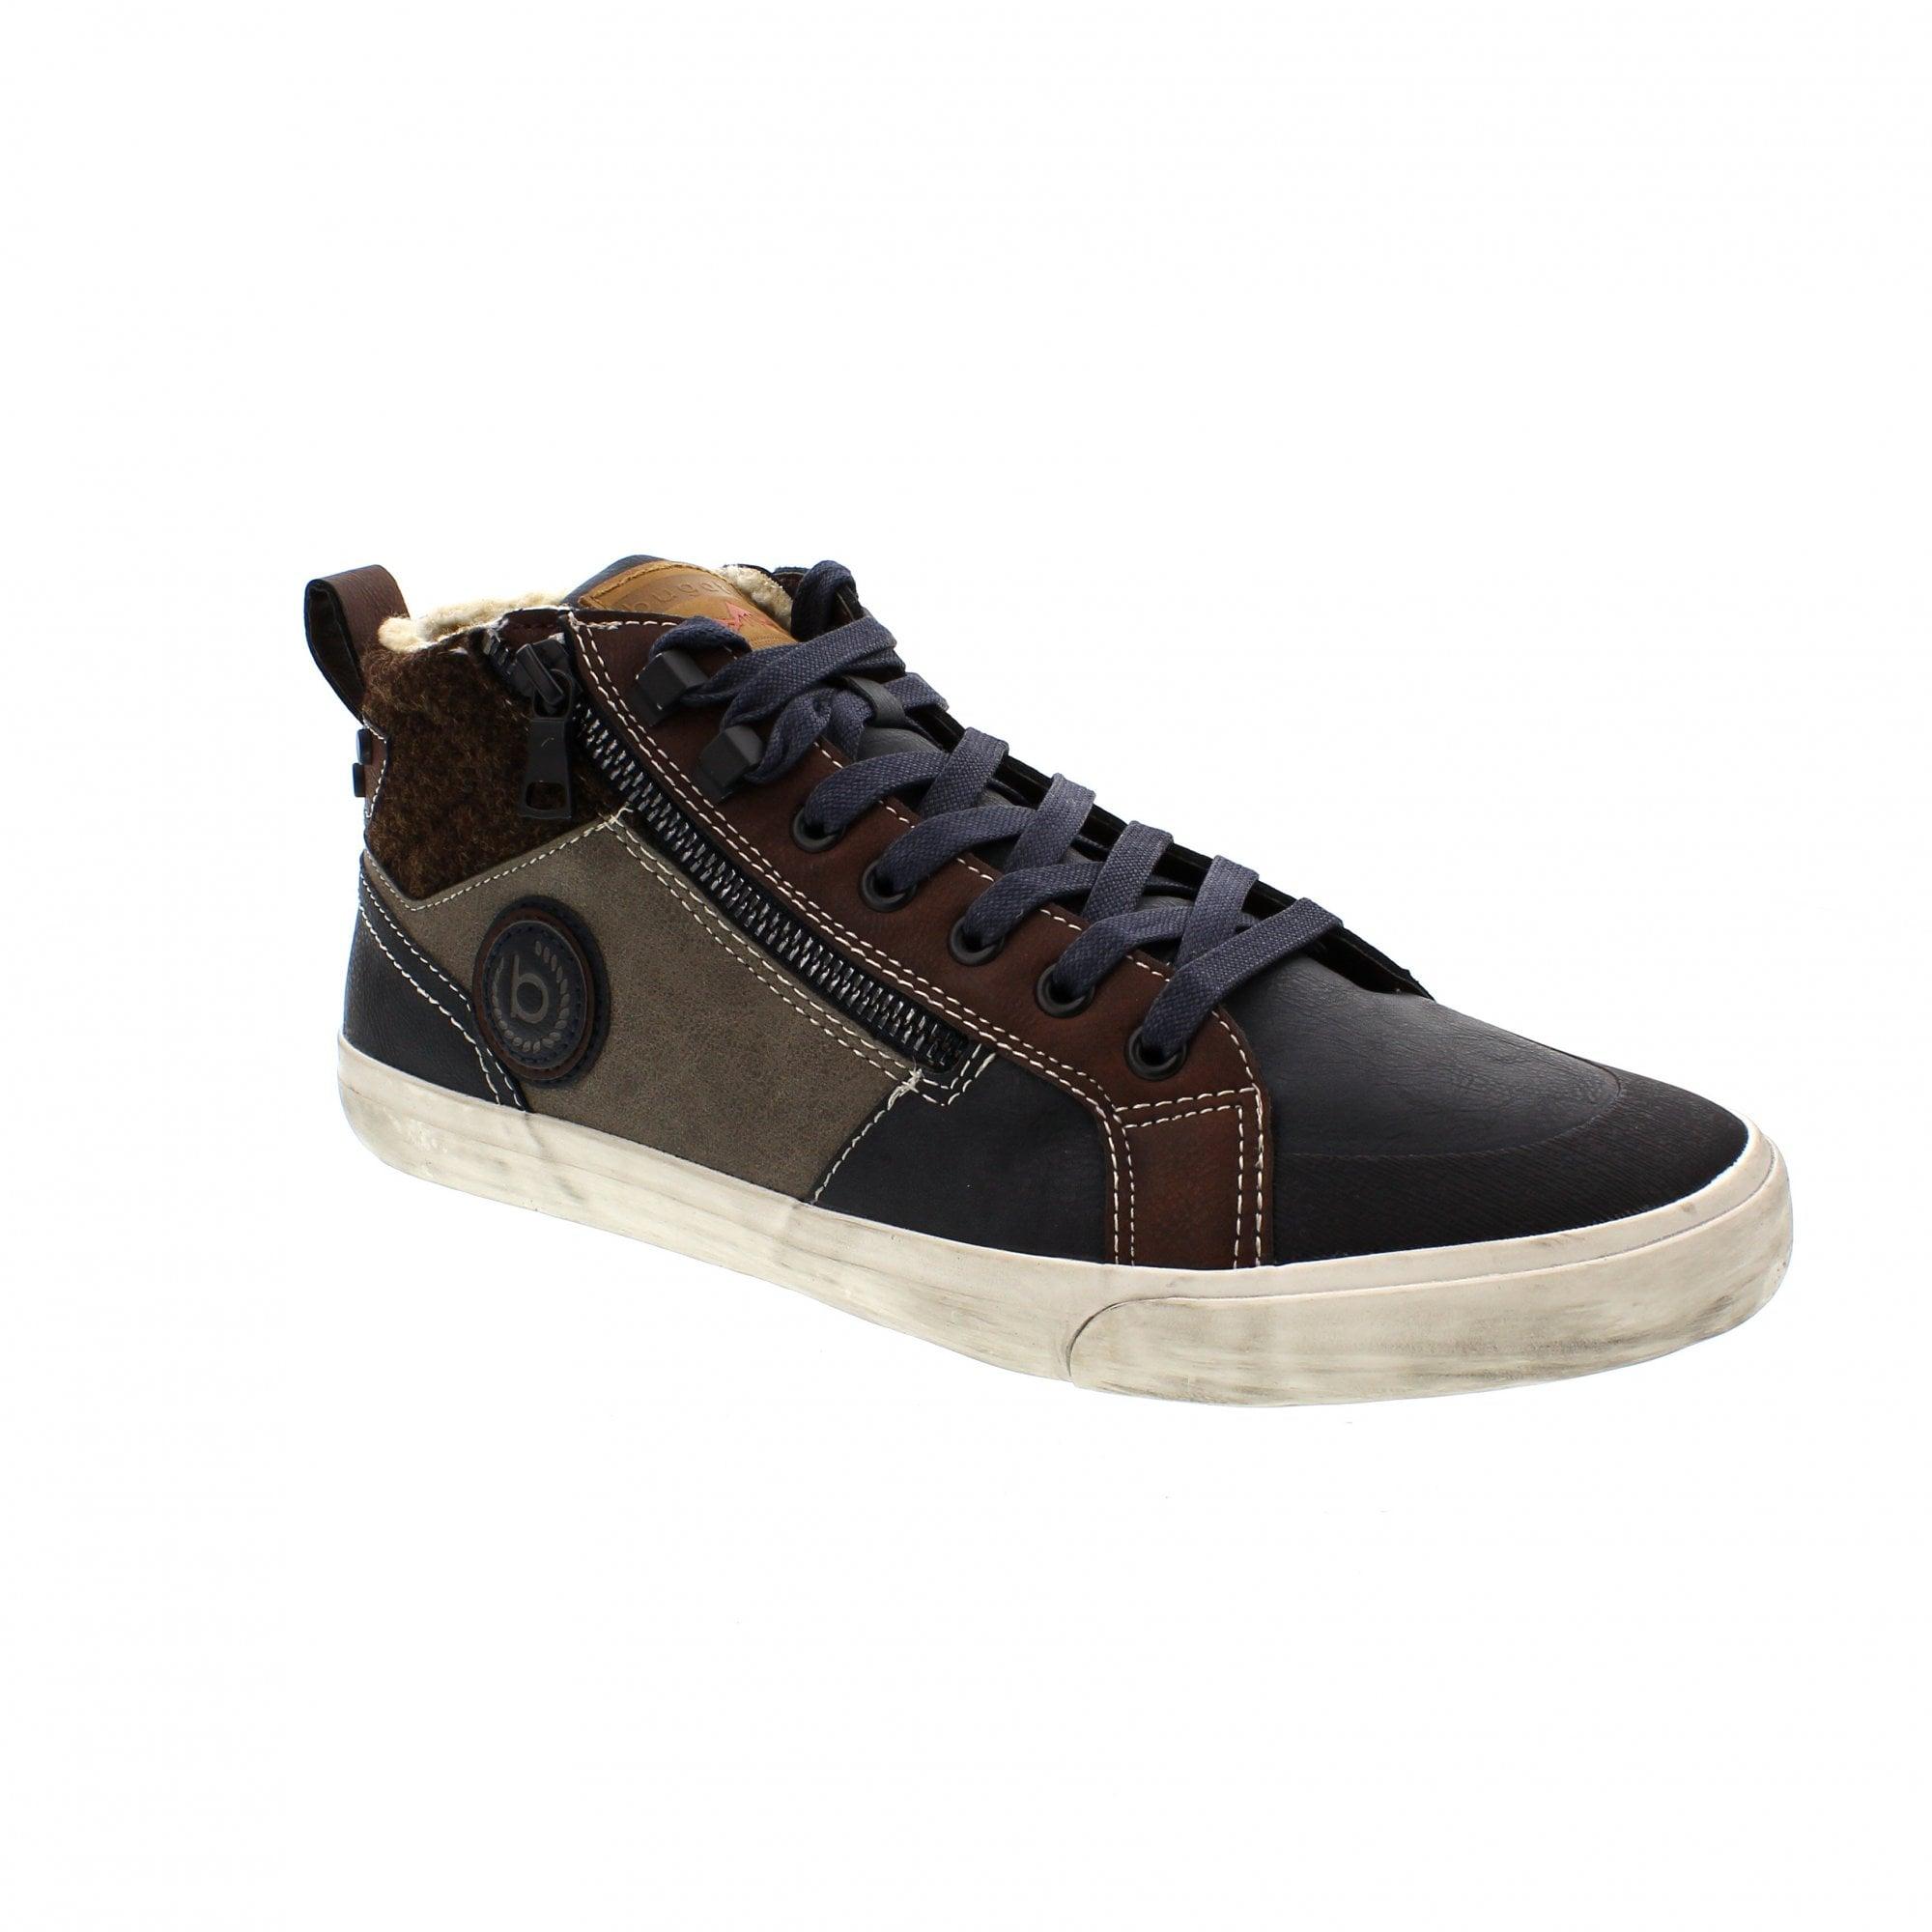 Bugatti Mahalo 321 30454 5959 8141 Mens Ankle Boots